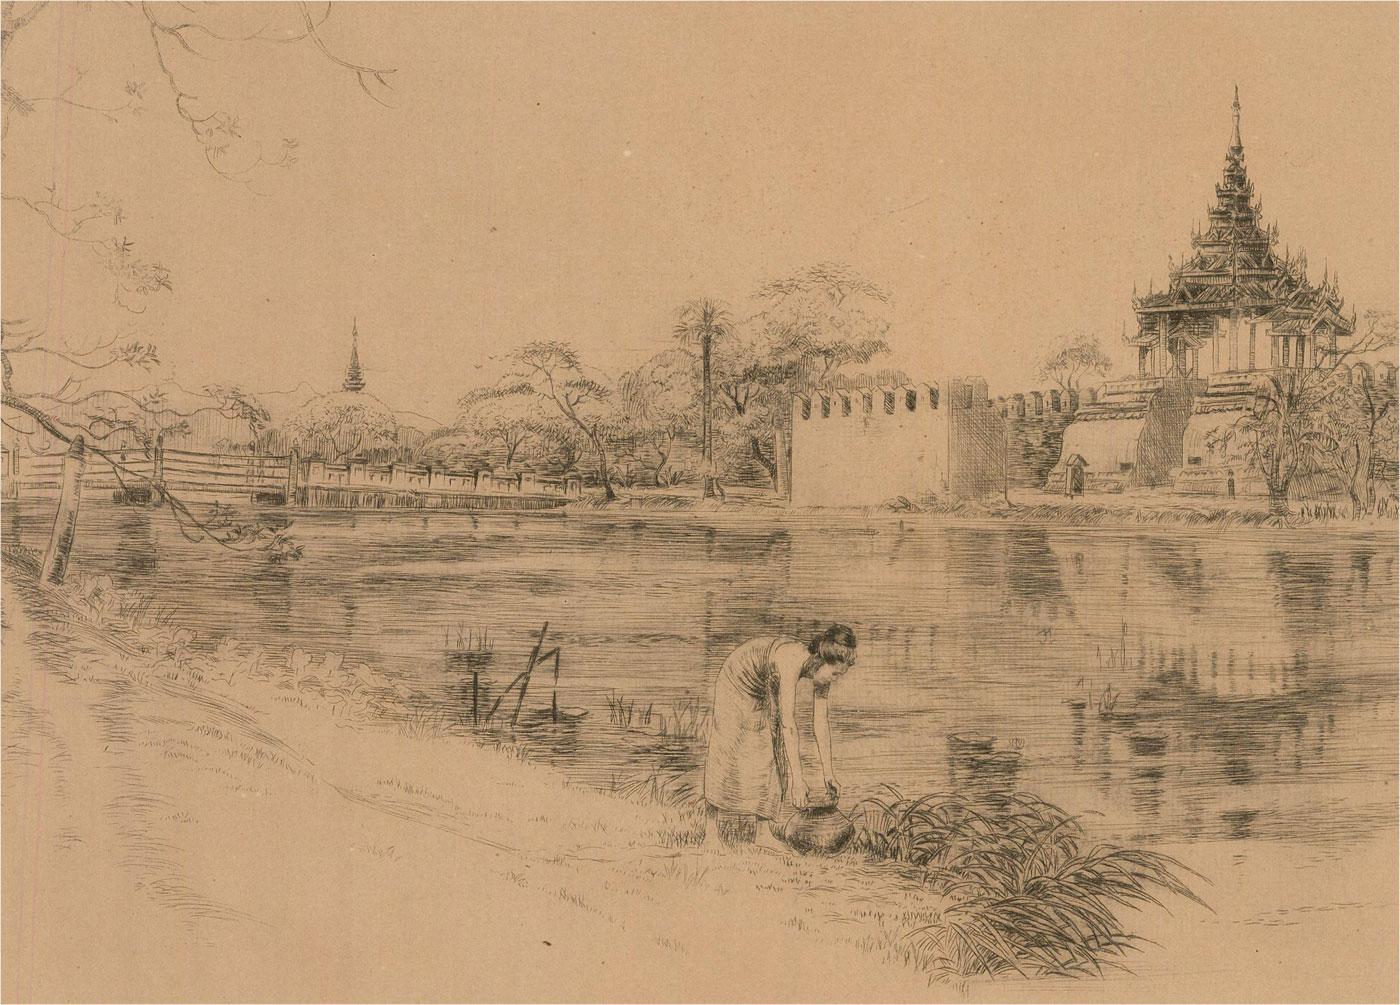 Eric Gordon MacColl (1896-1973_ - 1928 Etching, The South Moat, Mandalay